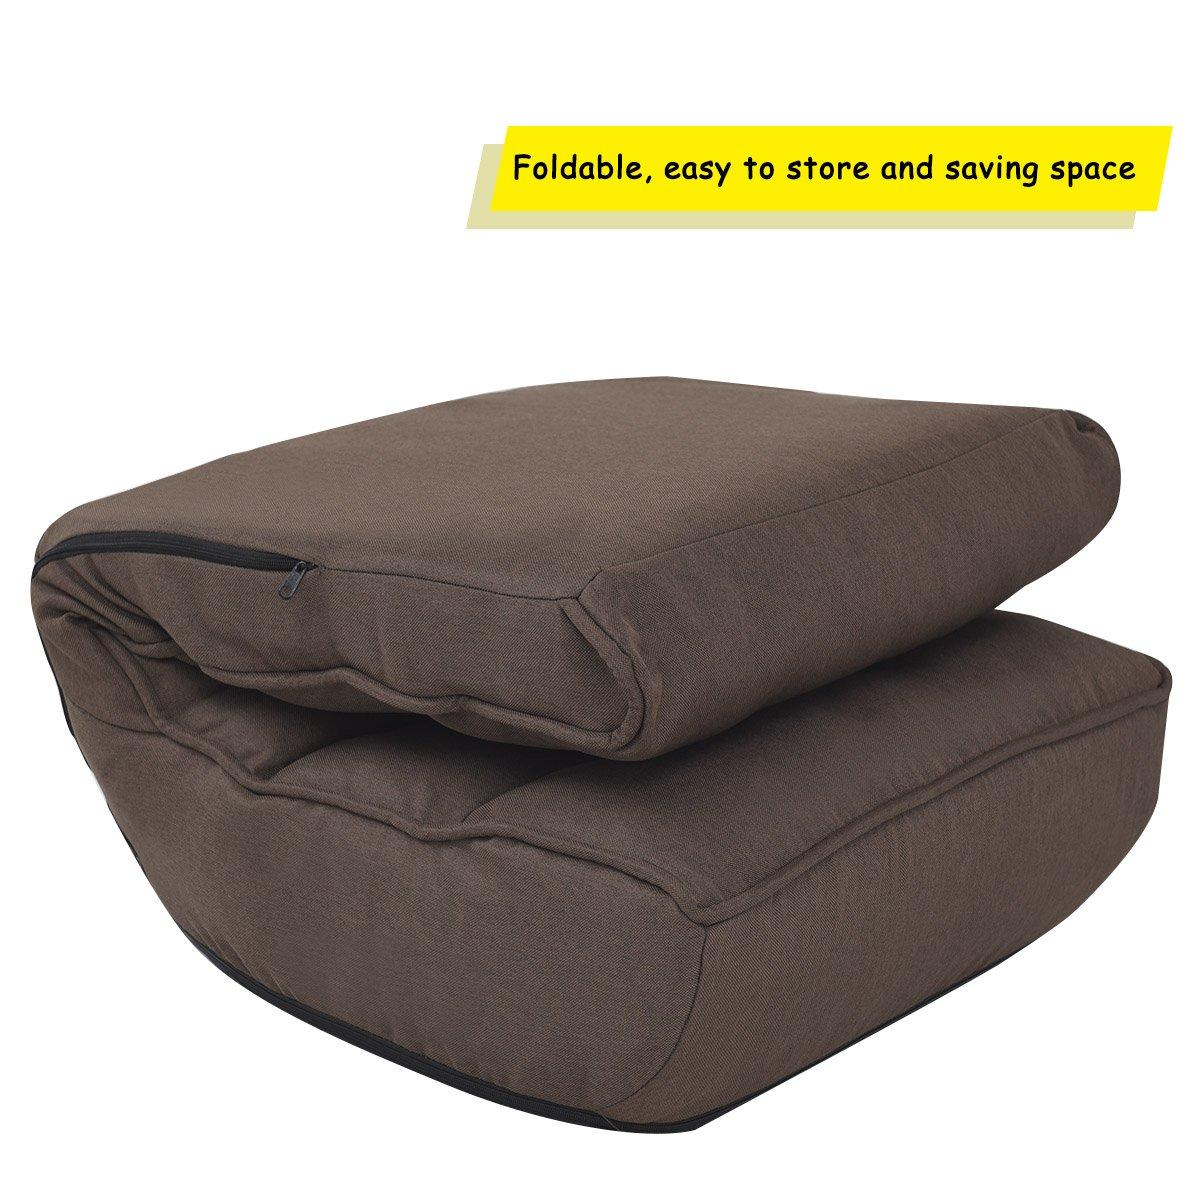 Amazon.com: Giantex silla de piso Sleeper plegable de ángulo ...